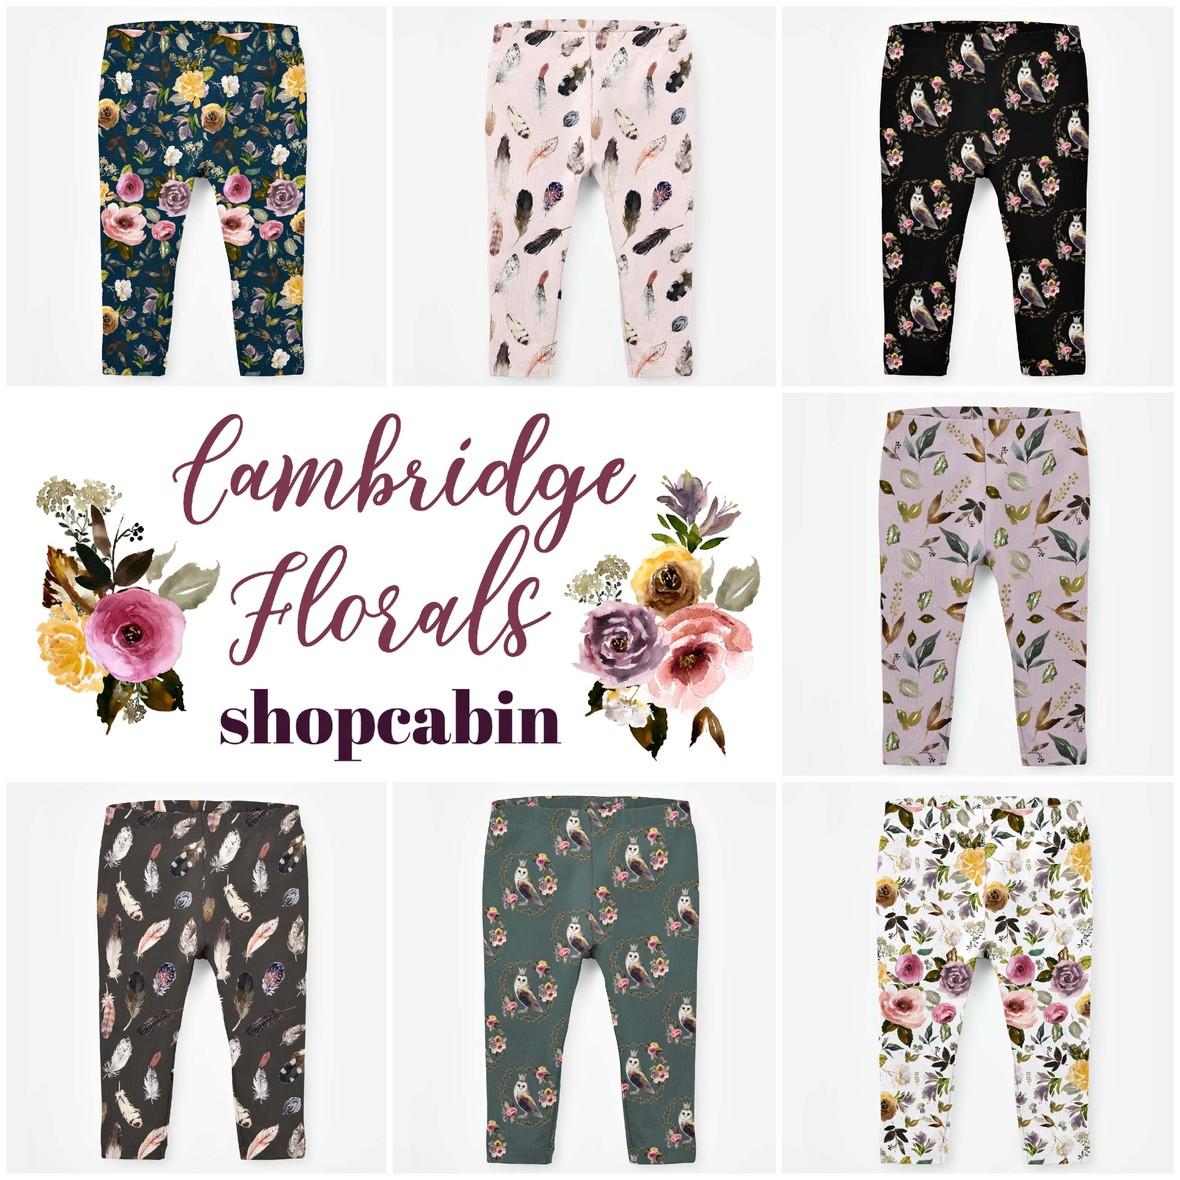 Cambridge florals baby leggings